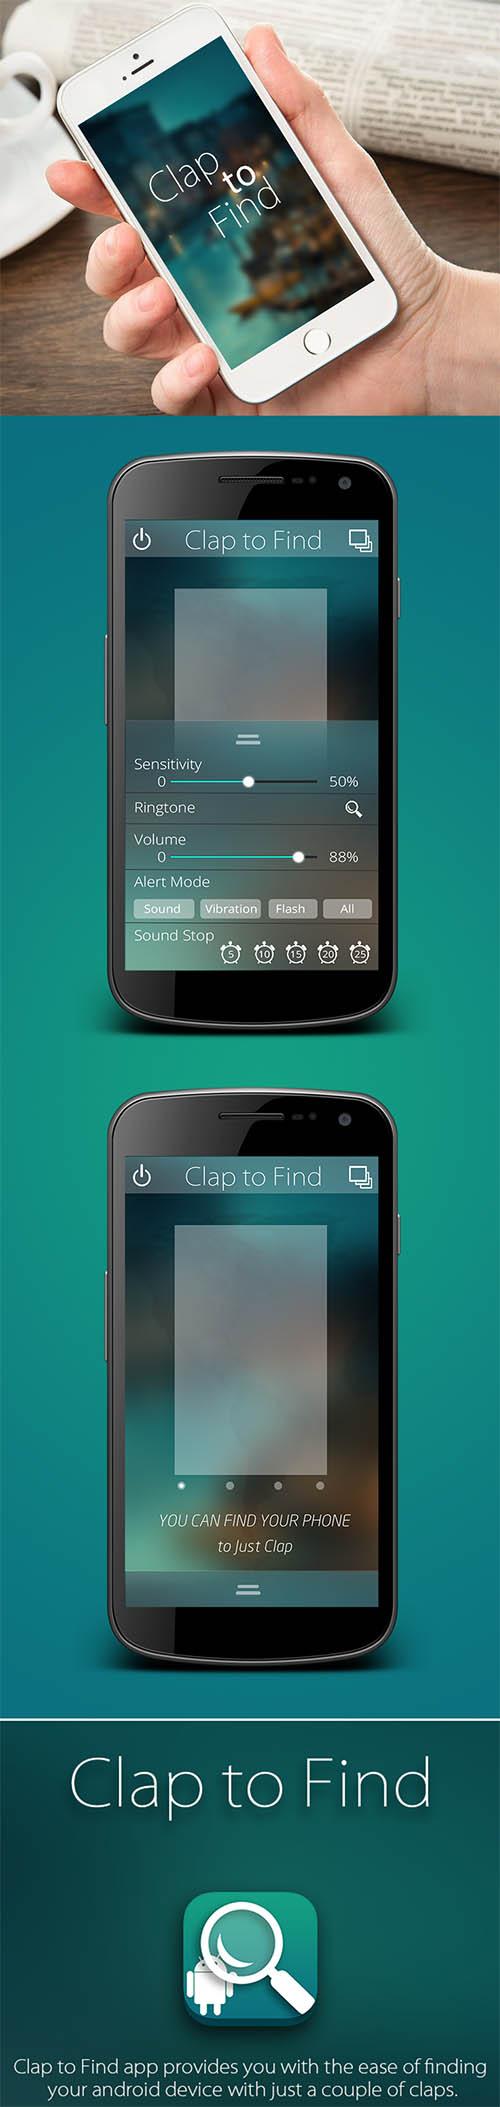 App_Design_Android_Clap_to_Find_vvk By vvk swami